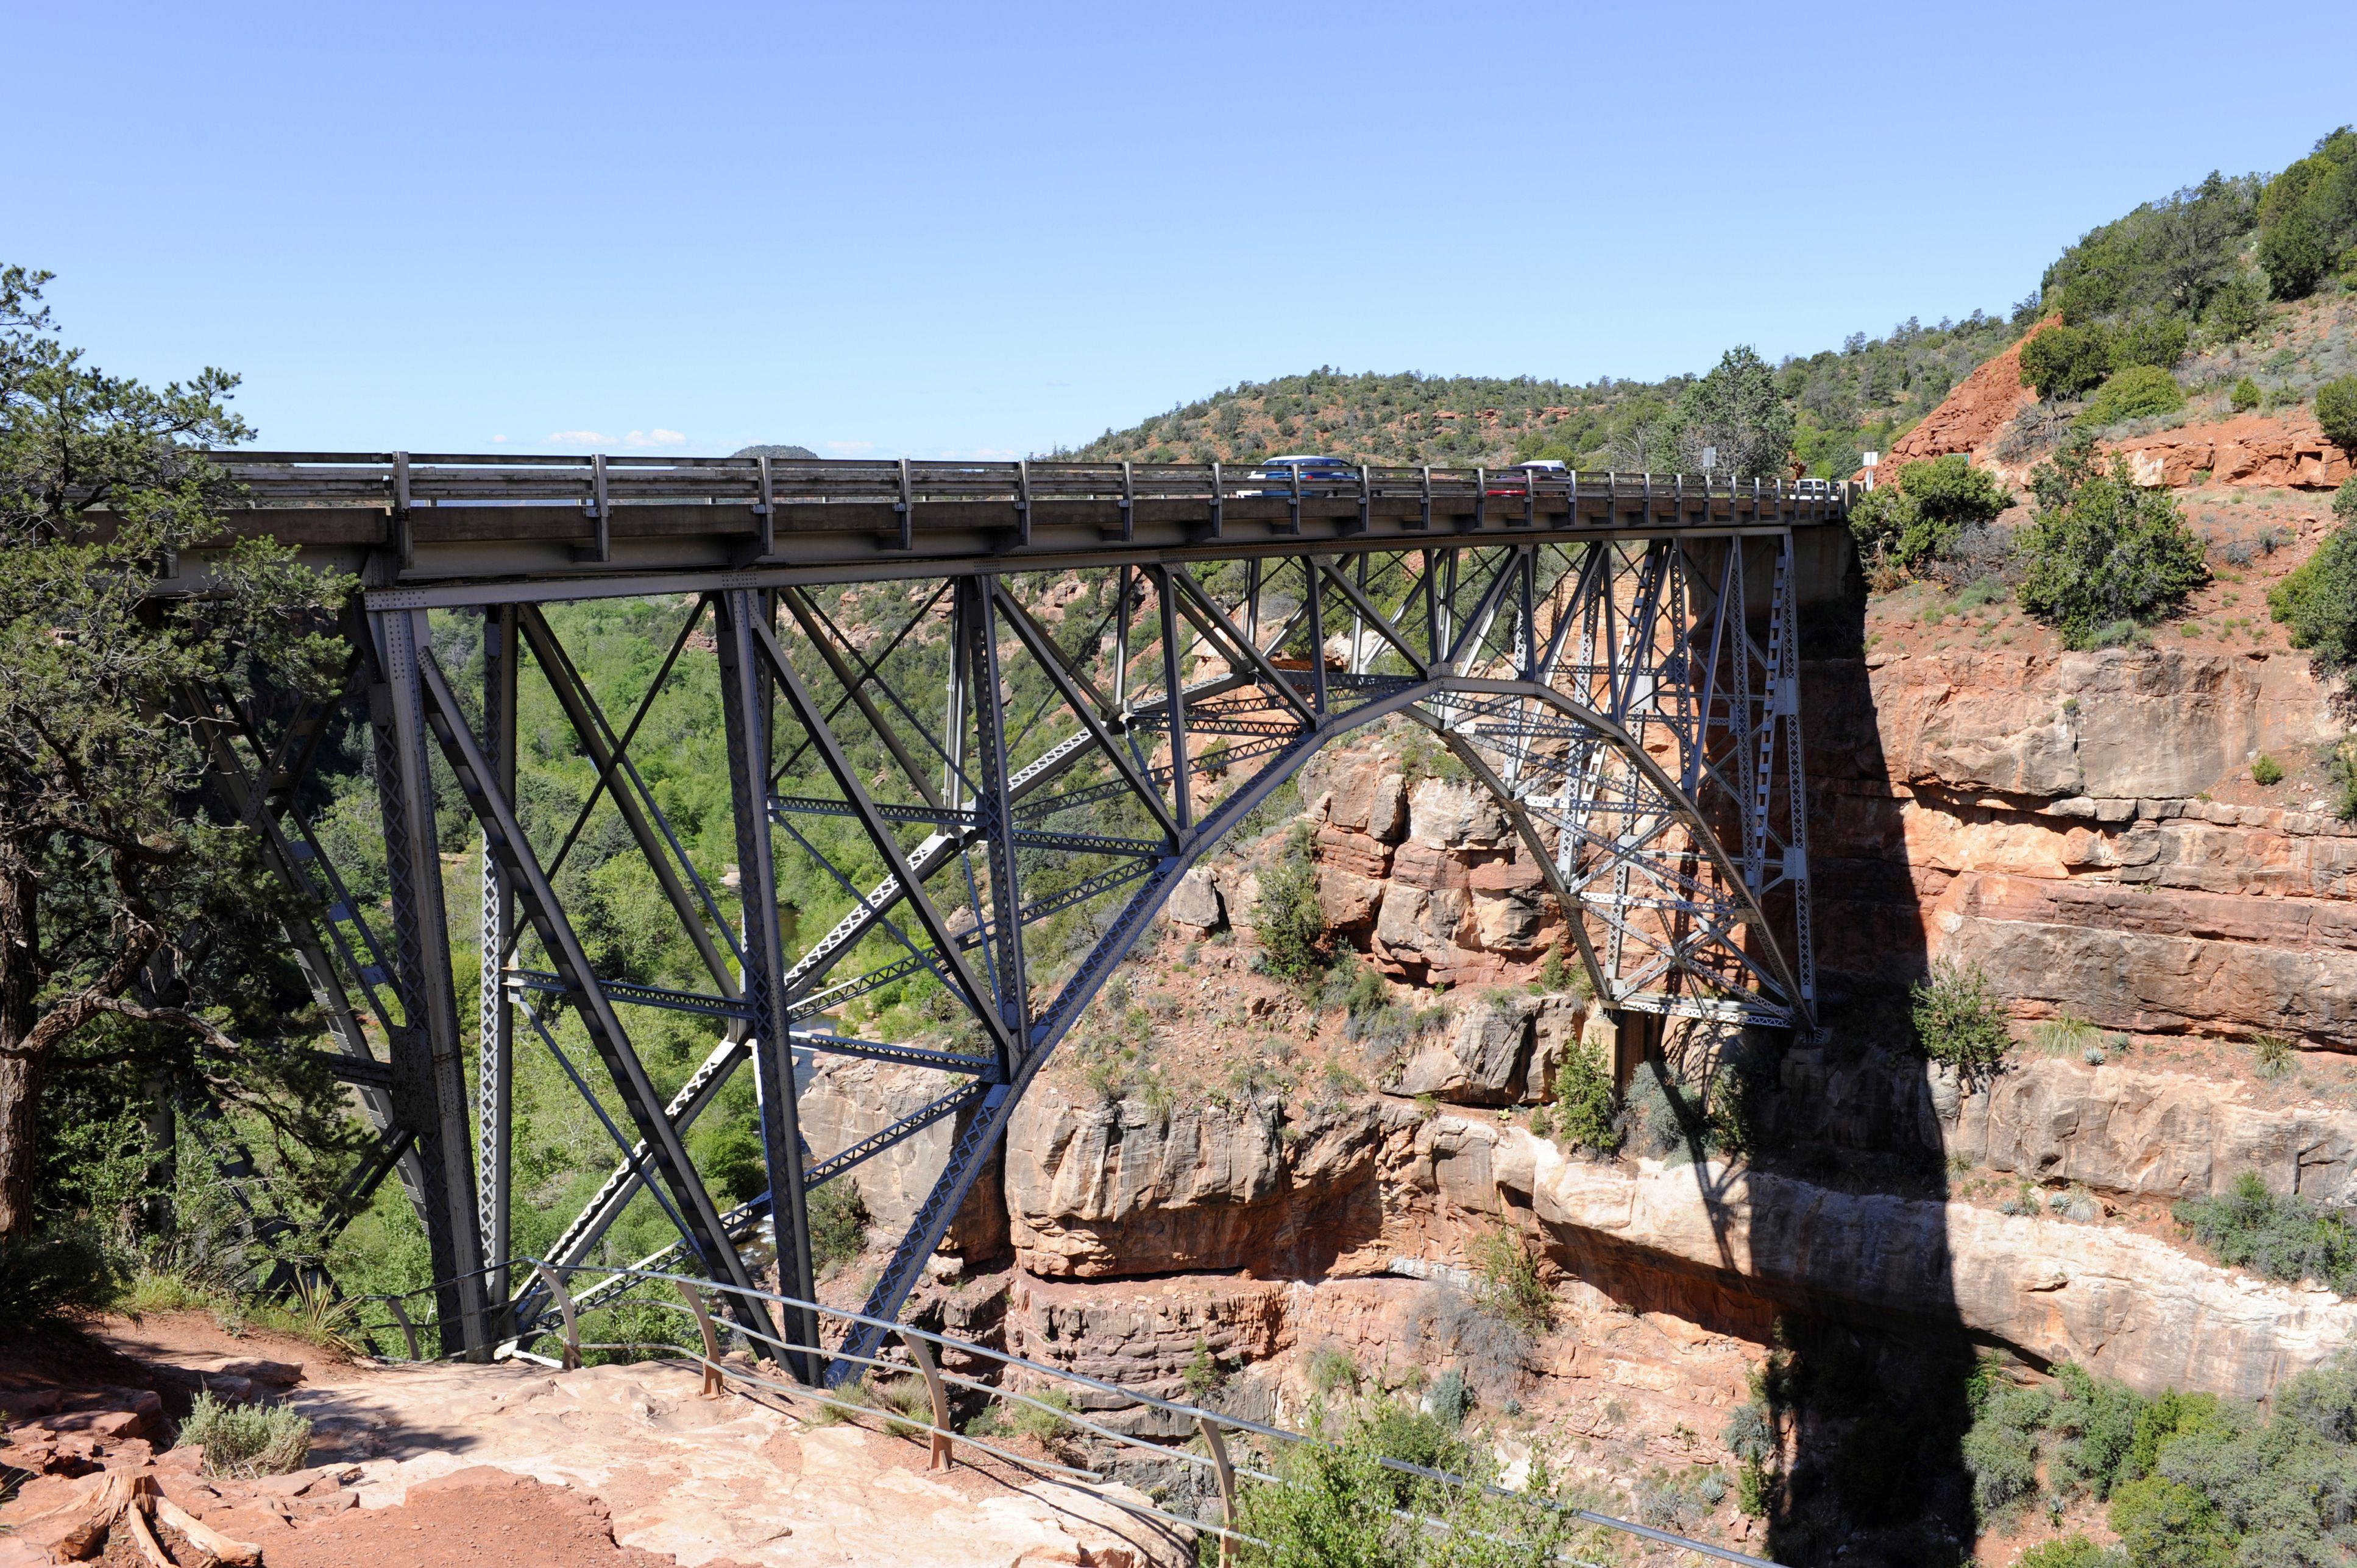 Midgley Bridge Highway 89A, Sedona, Arizona, USA